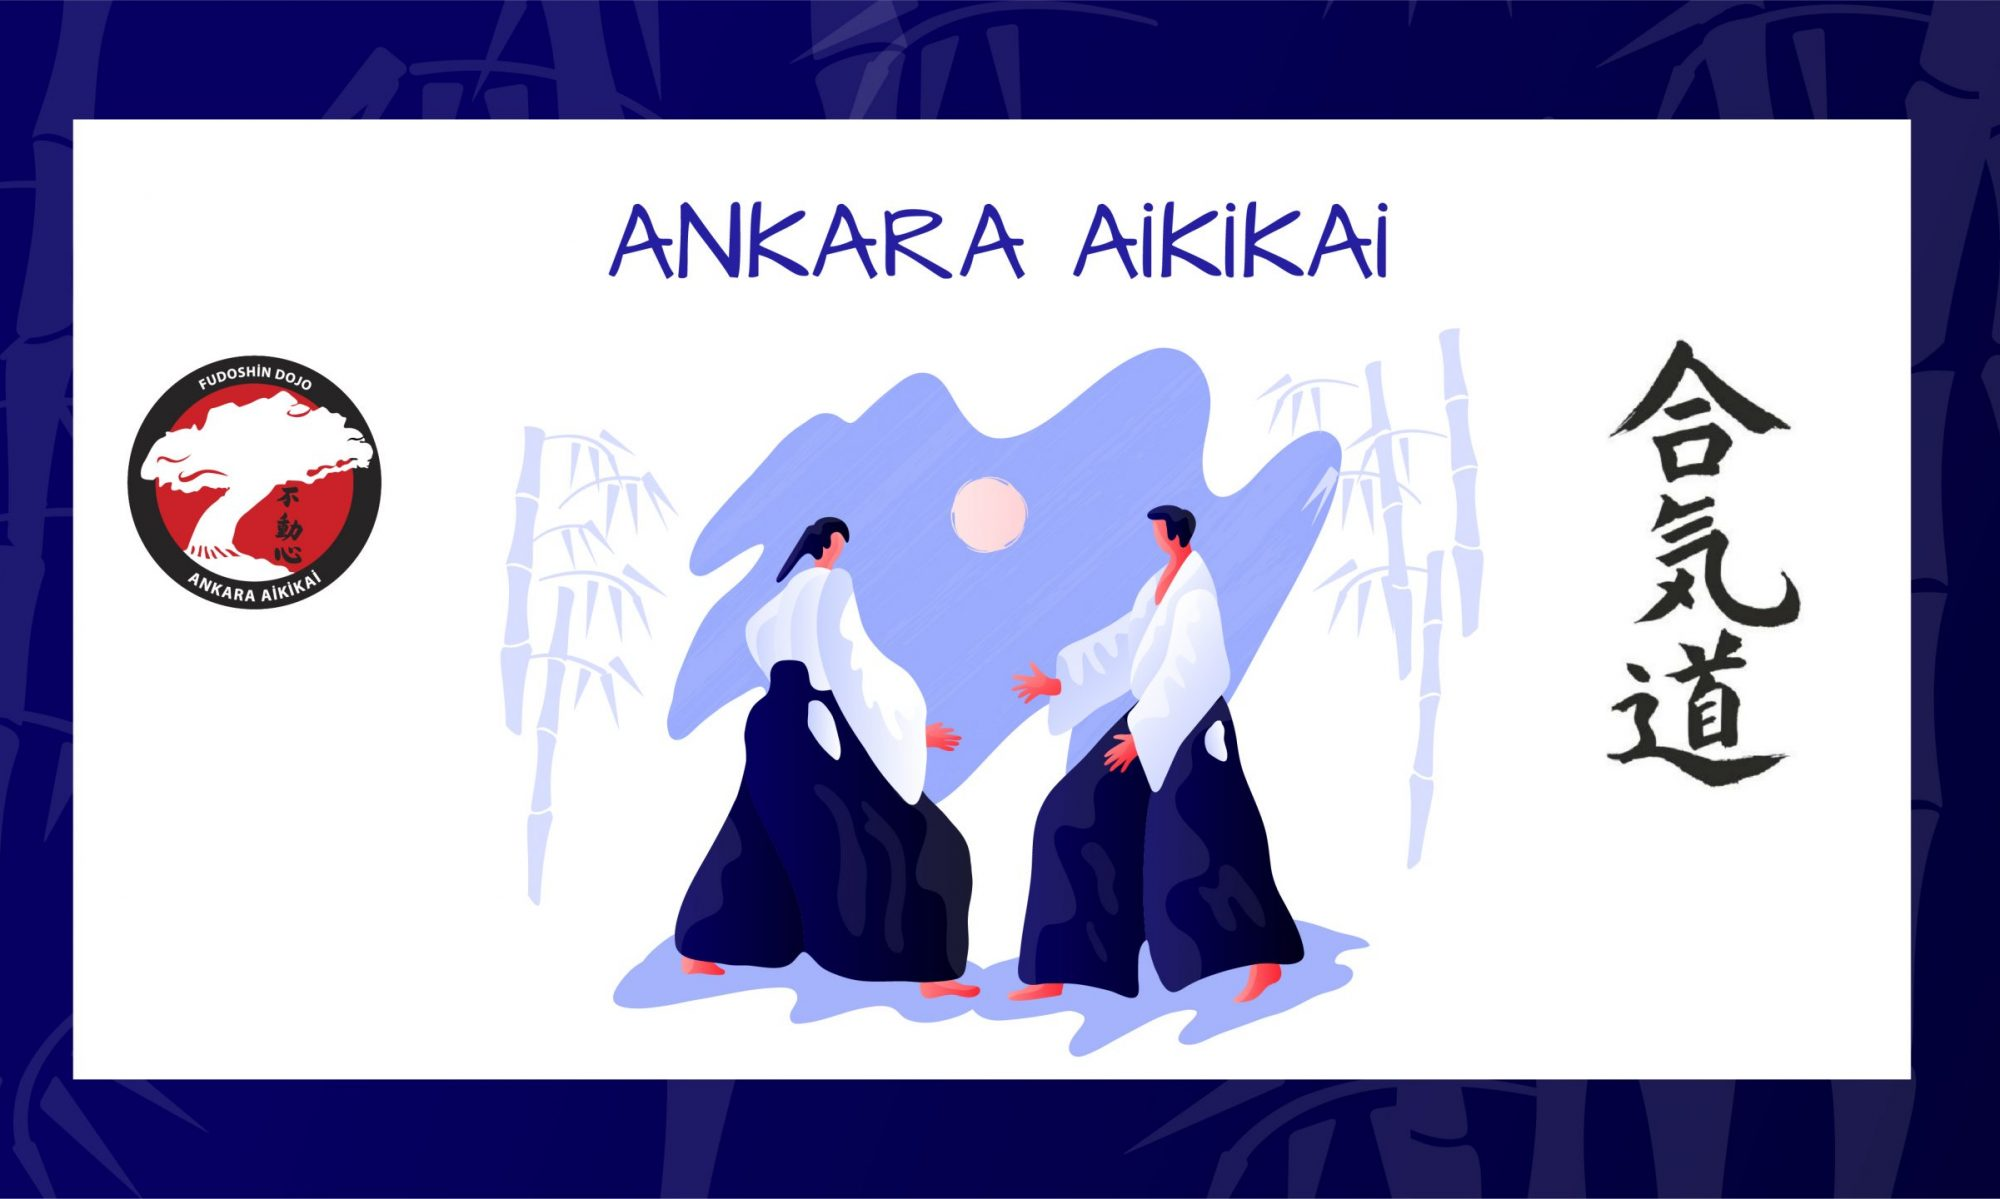 Ankara Aikikai